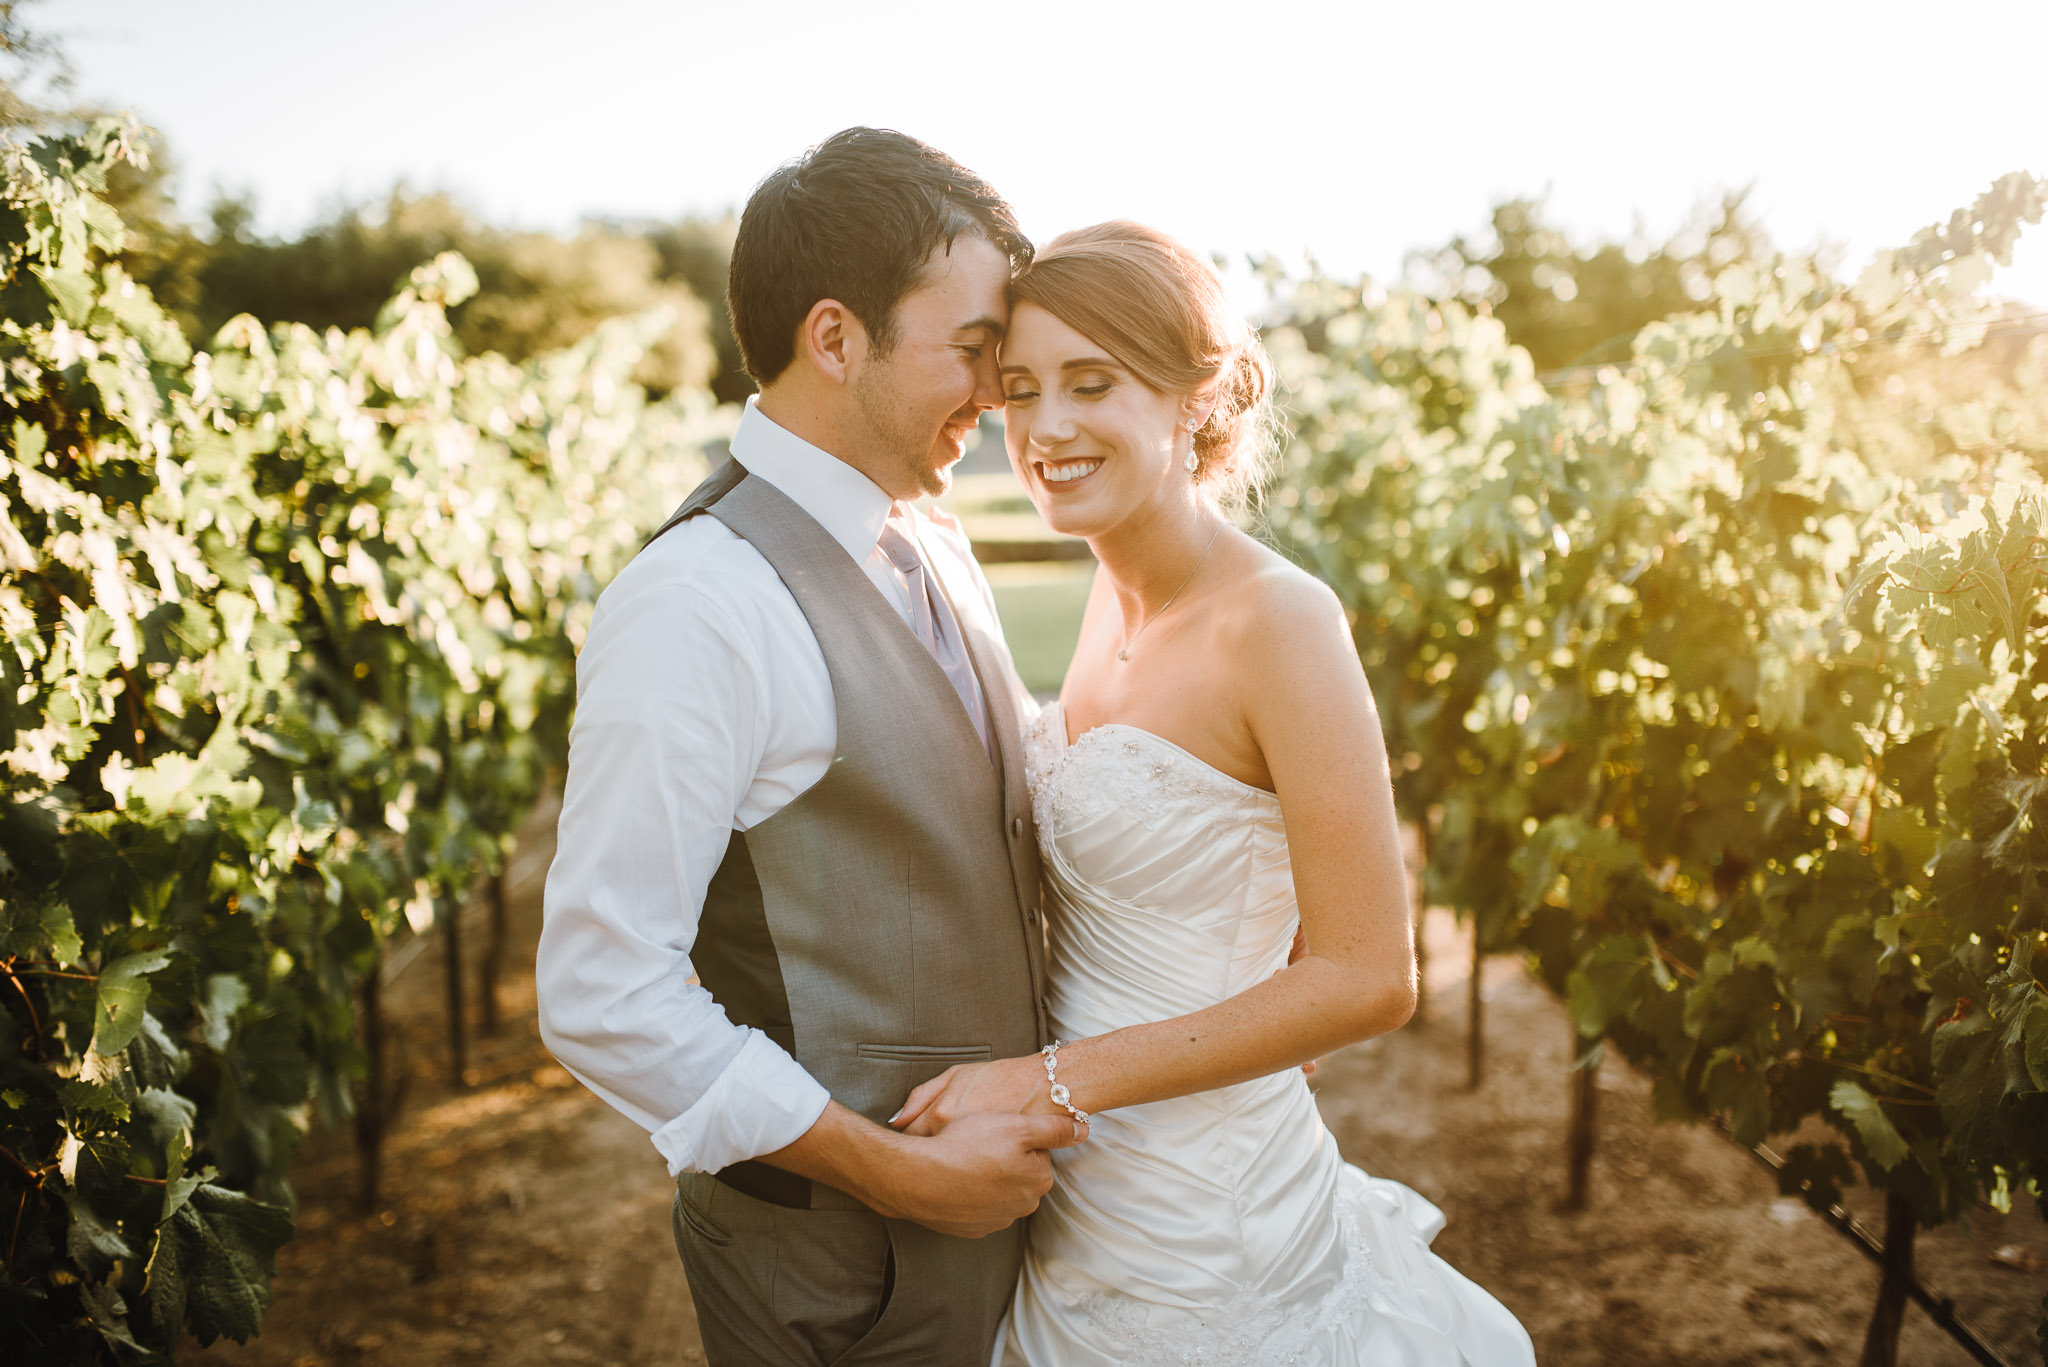 Chapel-In-The-Vineyard-Christoval-Vineyards-and-Winery-Wedding_Kayla&Eric-0061.jpg